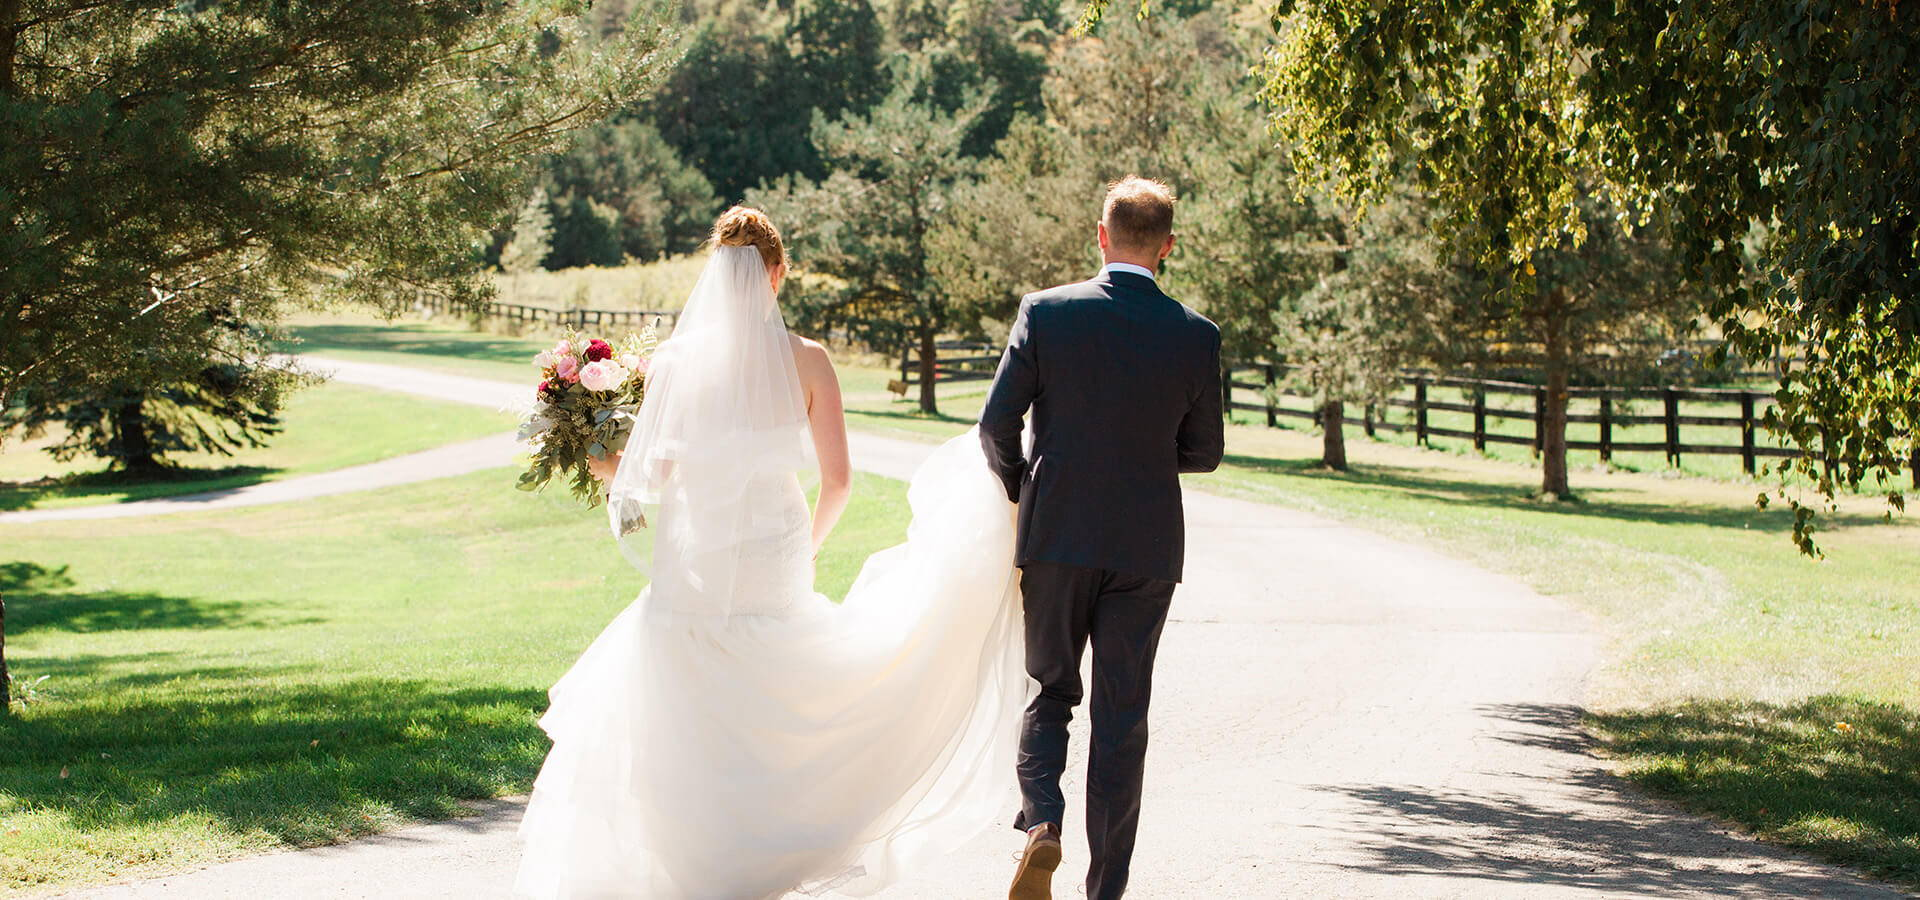 Hero image for Kalie & Jon's Rustic Wedding at Rainbow Valley Wedding Barn